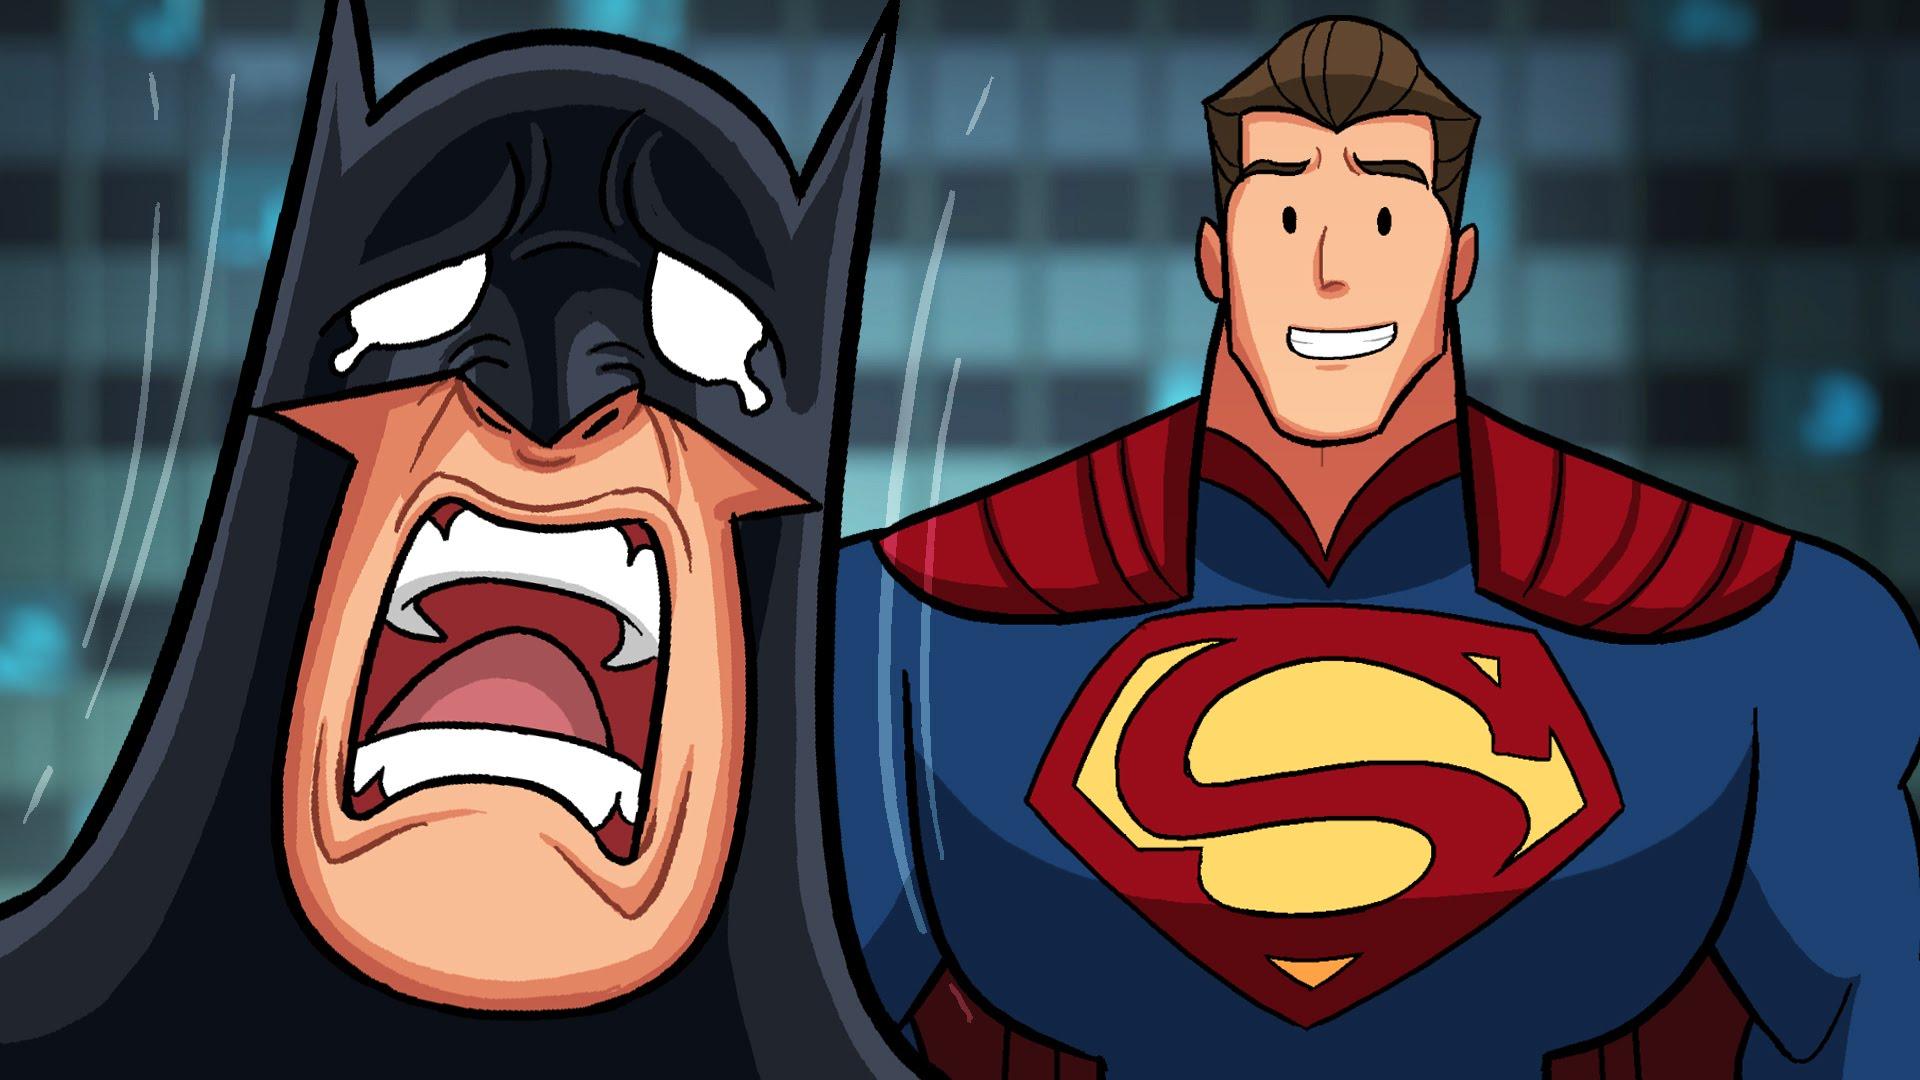 batman vs superman parodies